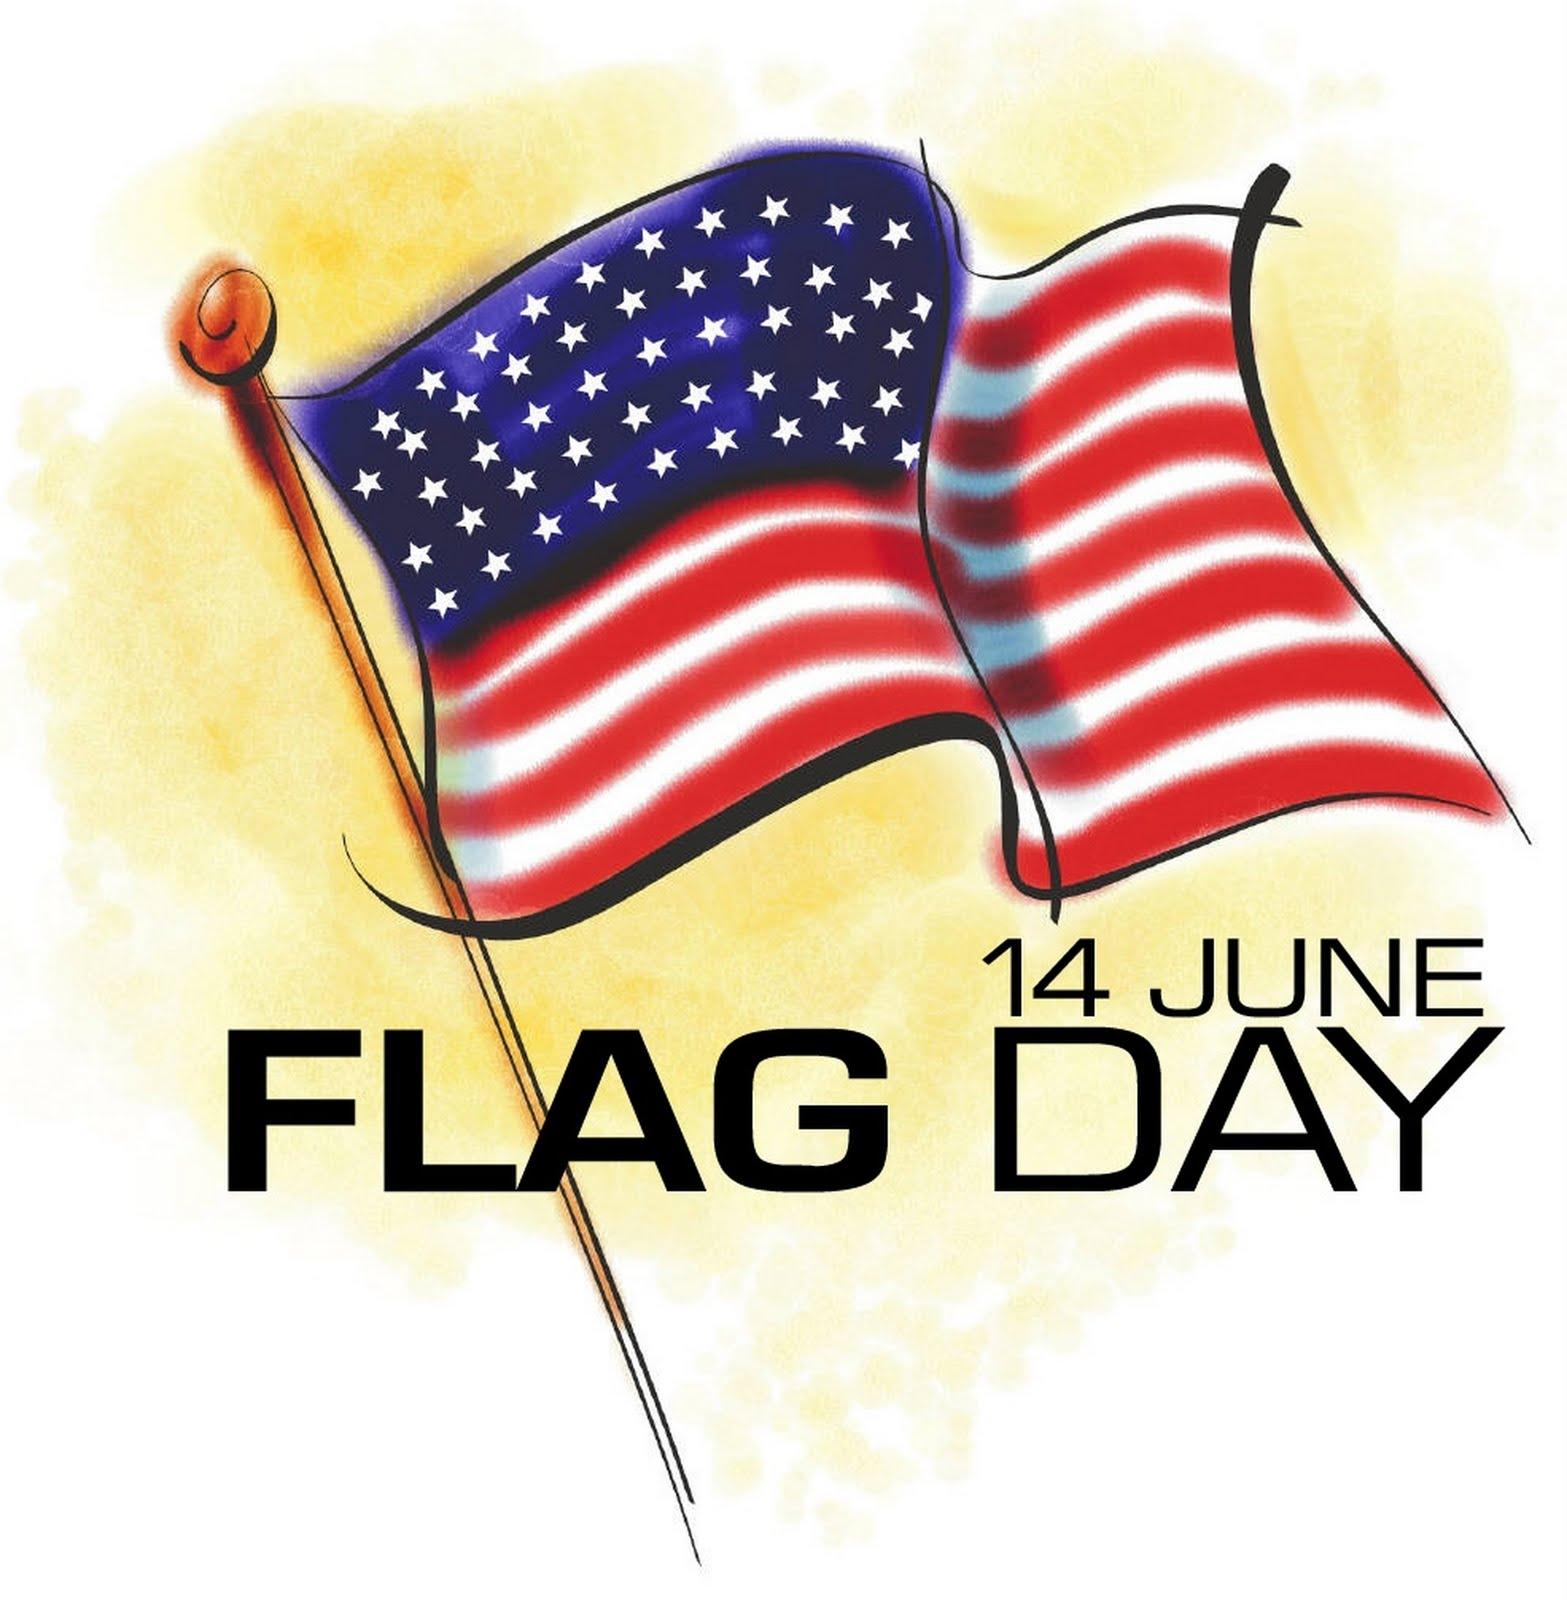 Veterans Day Clip Art Free Downloads | Clipart Panda - Free ...